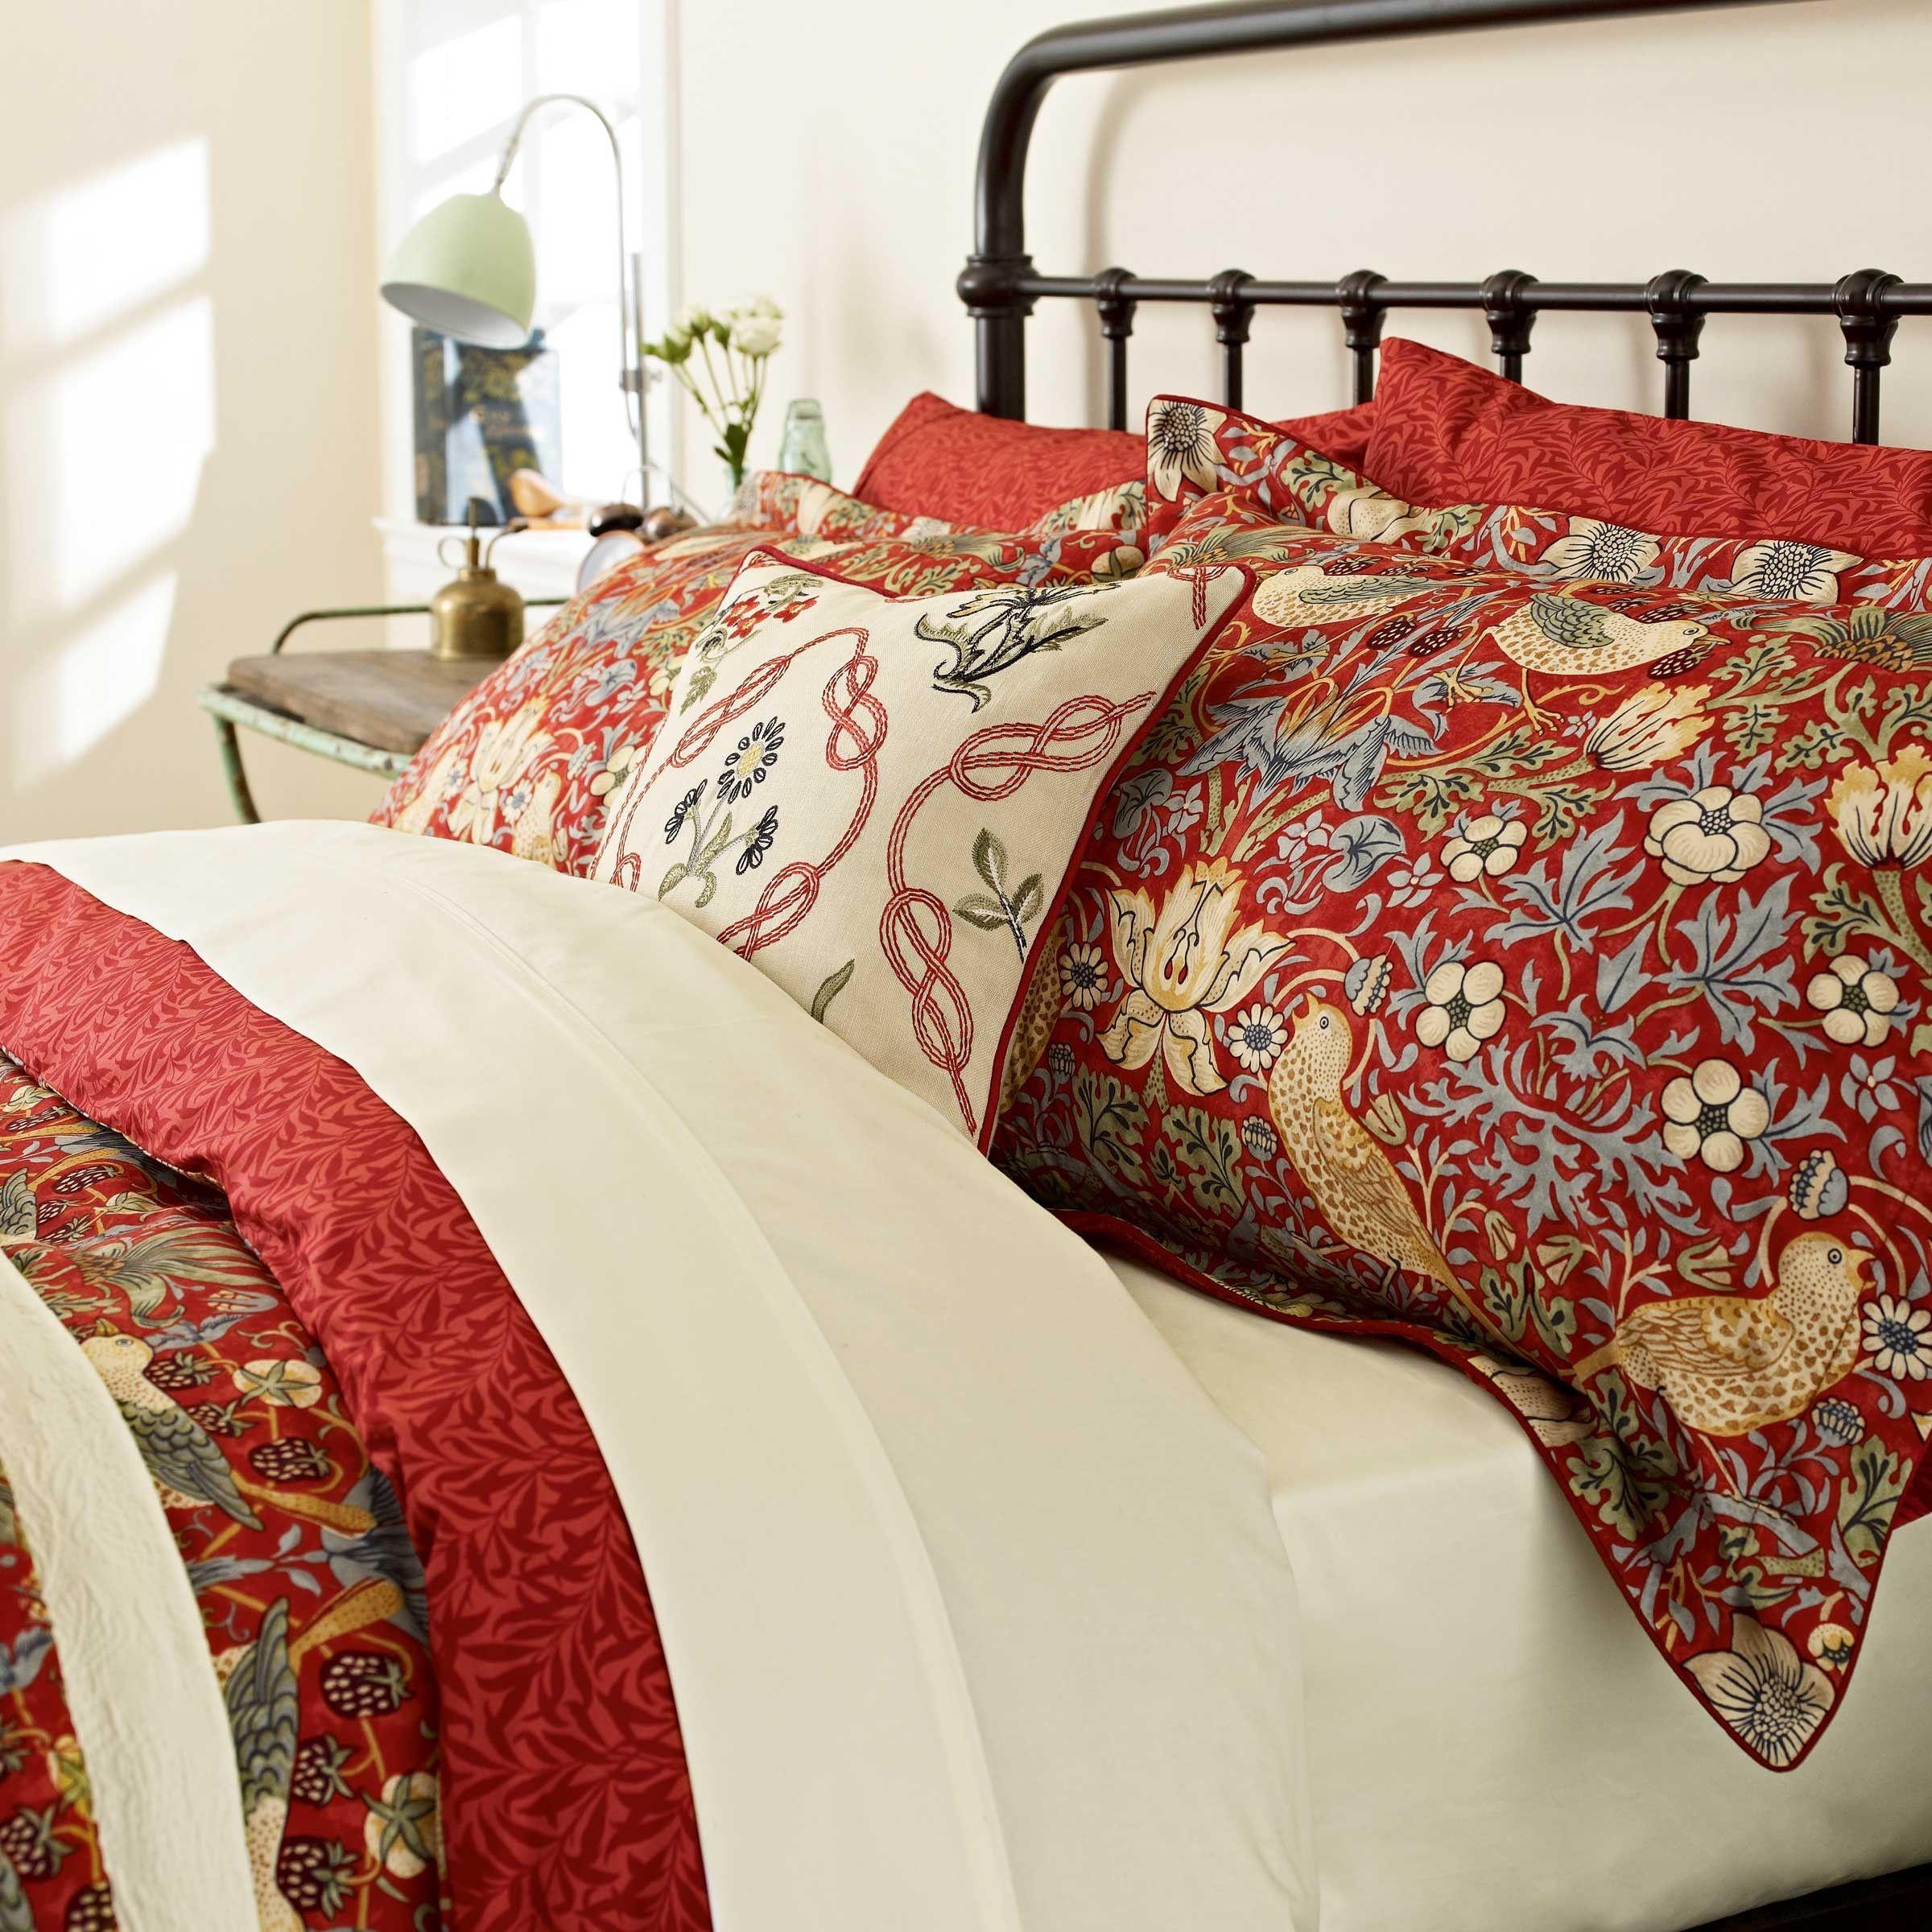 William Morris Strawberry Thief Crimson Bedding at Bedeck 1951